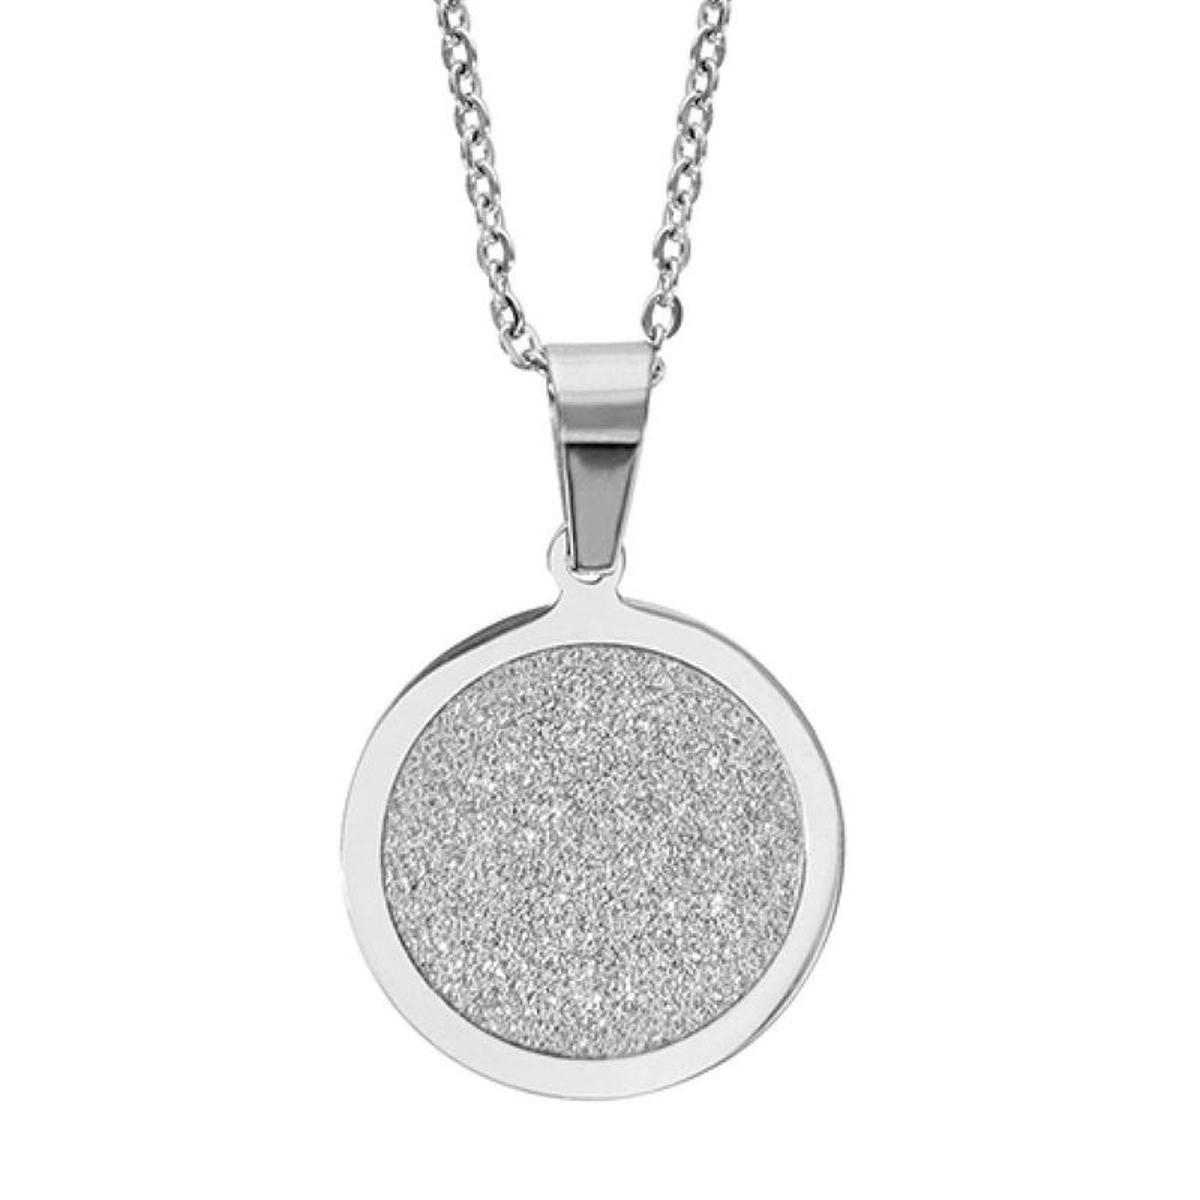 Collier 45 cm Pendentif Circulaire Disque Aspect Granit Acier